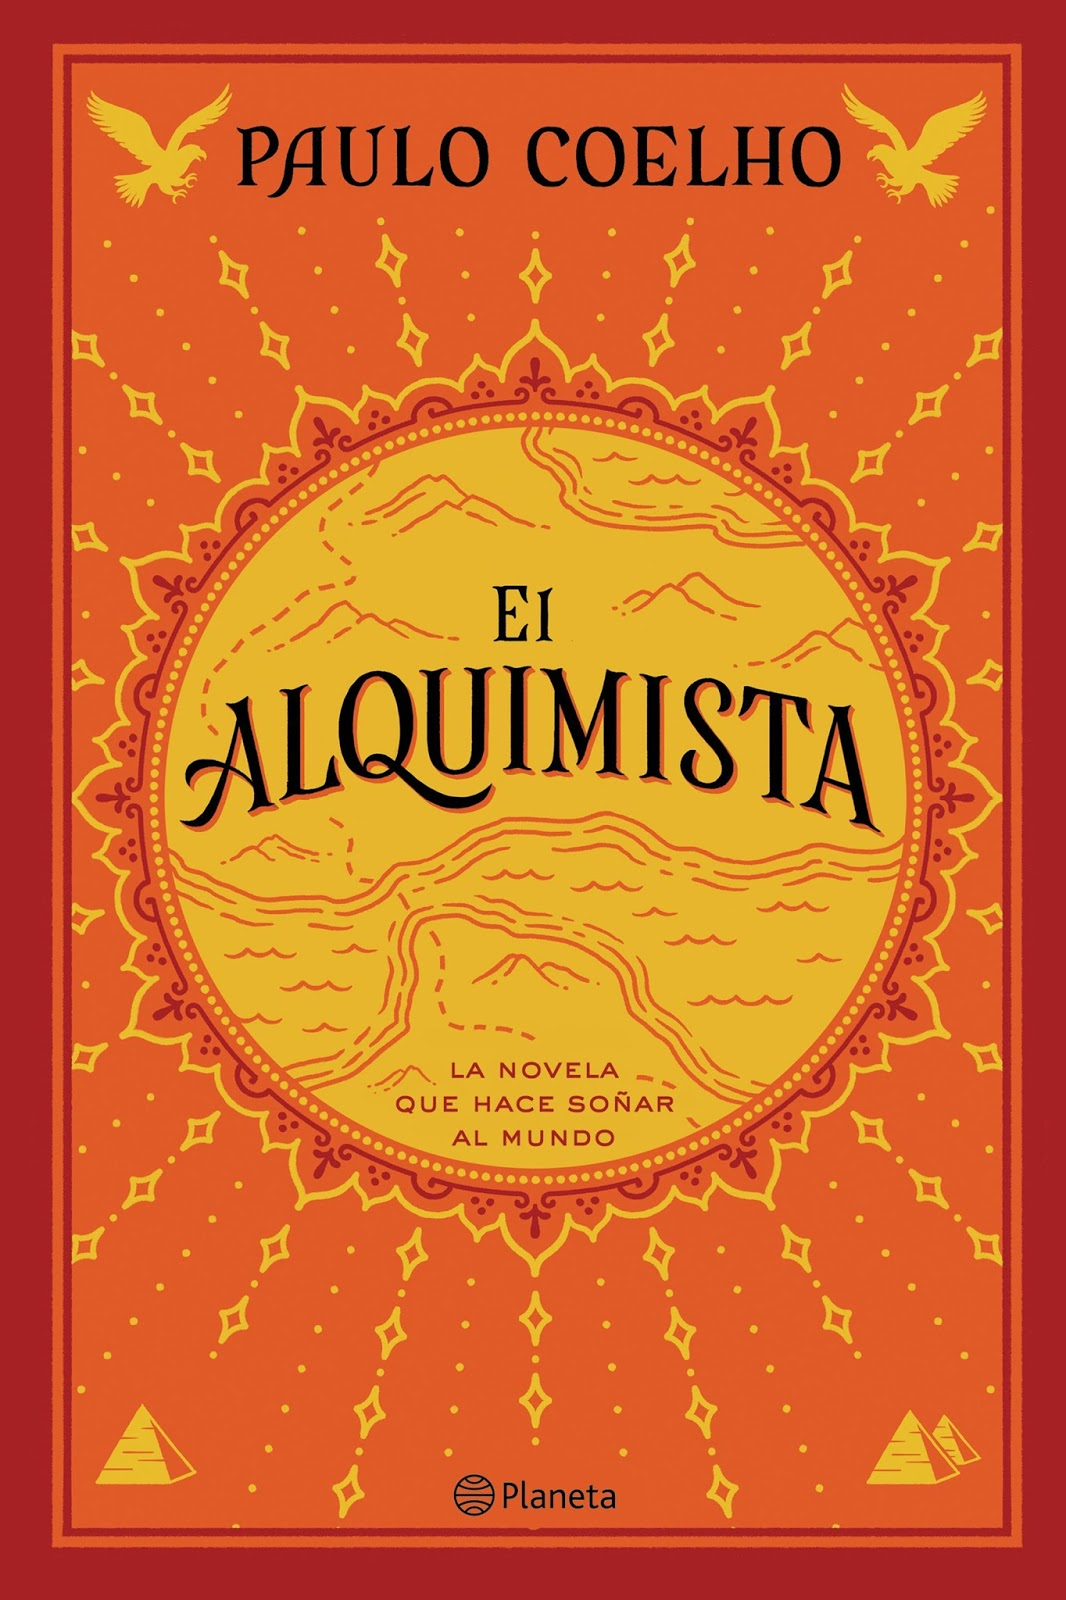 10-Portada-El-Alquimista-Paulo-Coelho